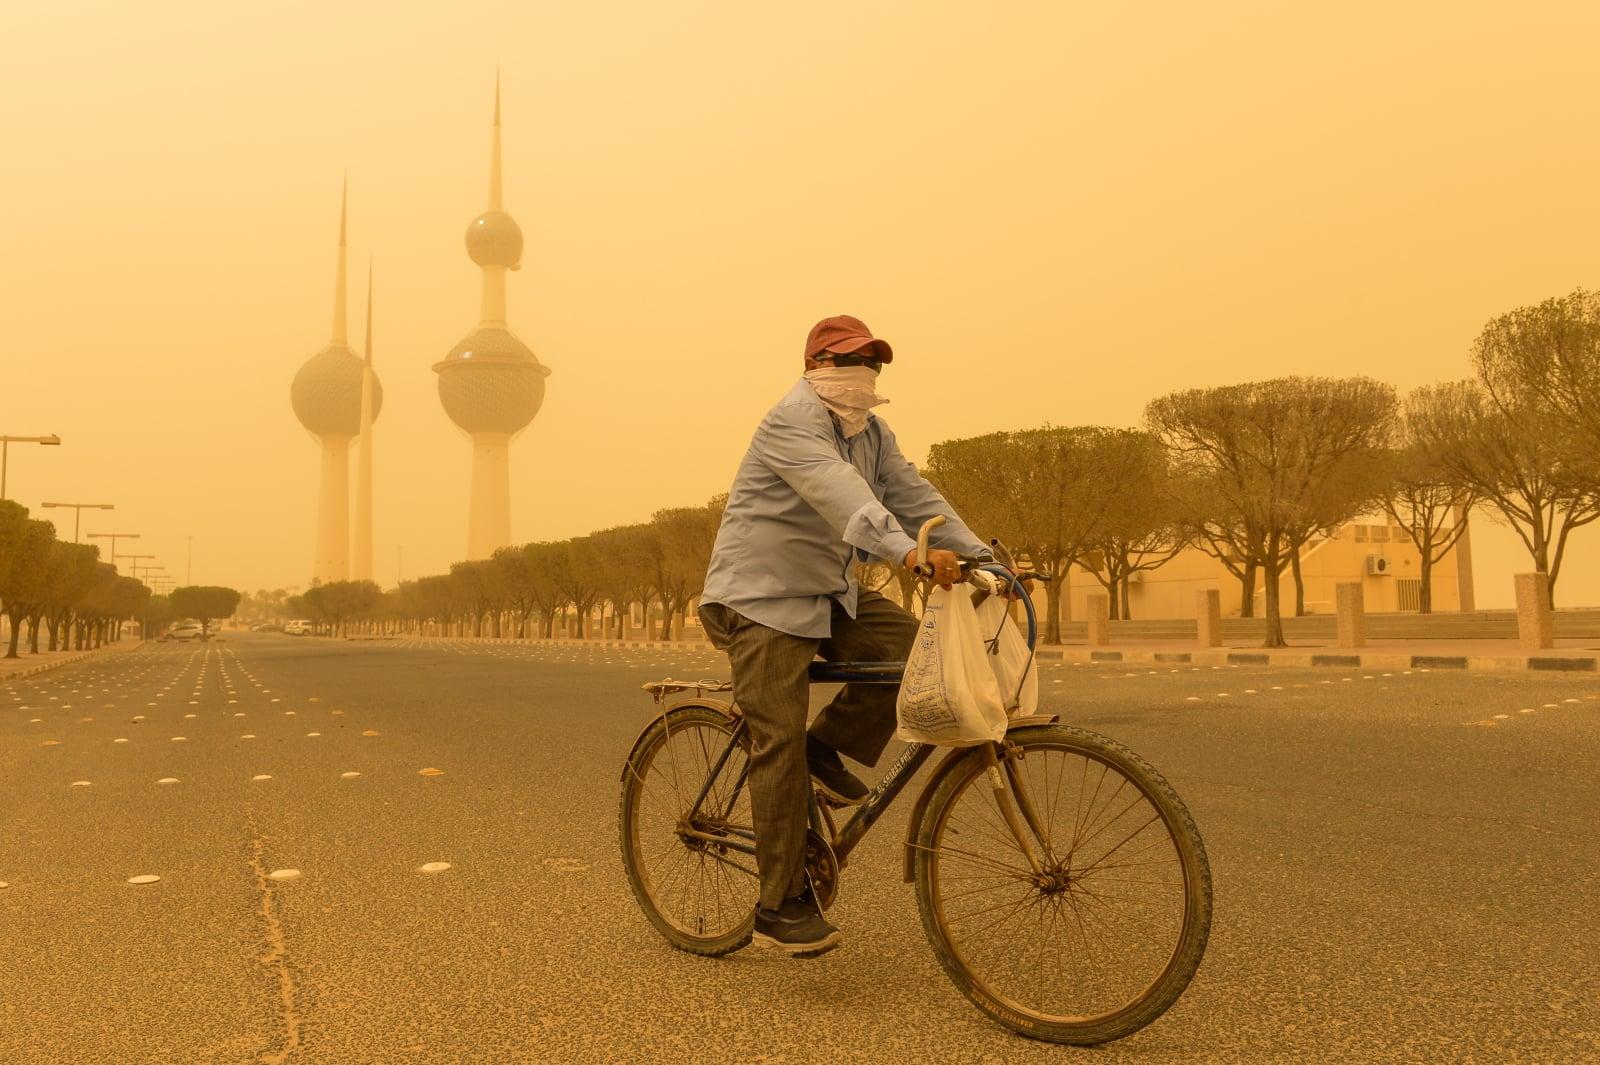 Ciężka burza piaskowa w Kuwejcie, fot. EPA/NOUFAL IBRAHIM